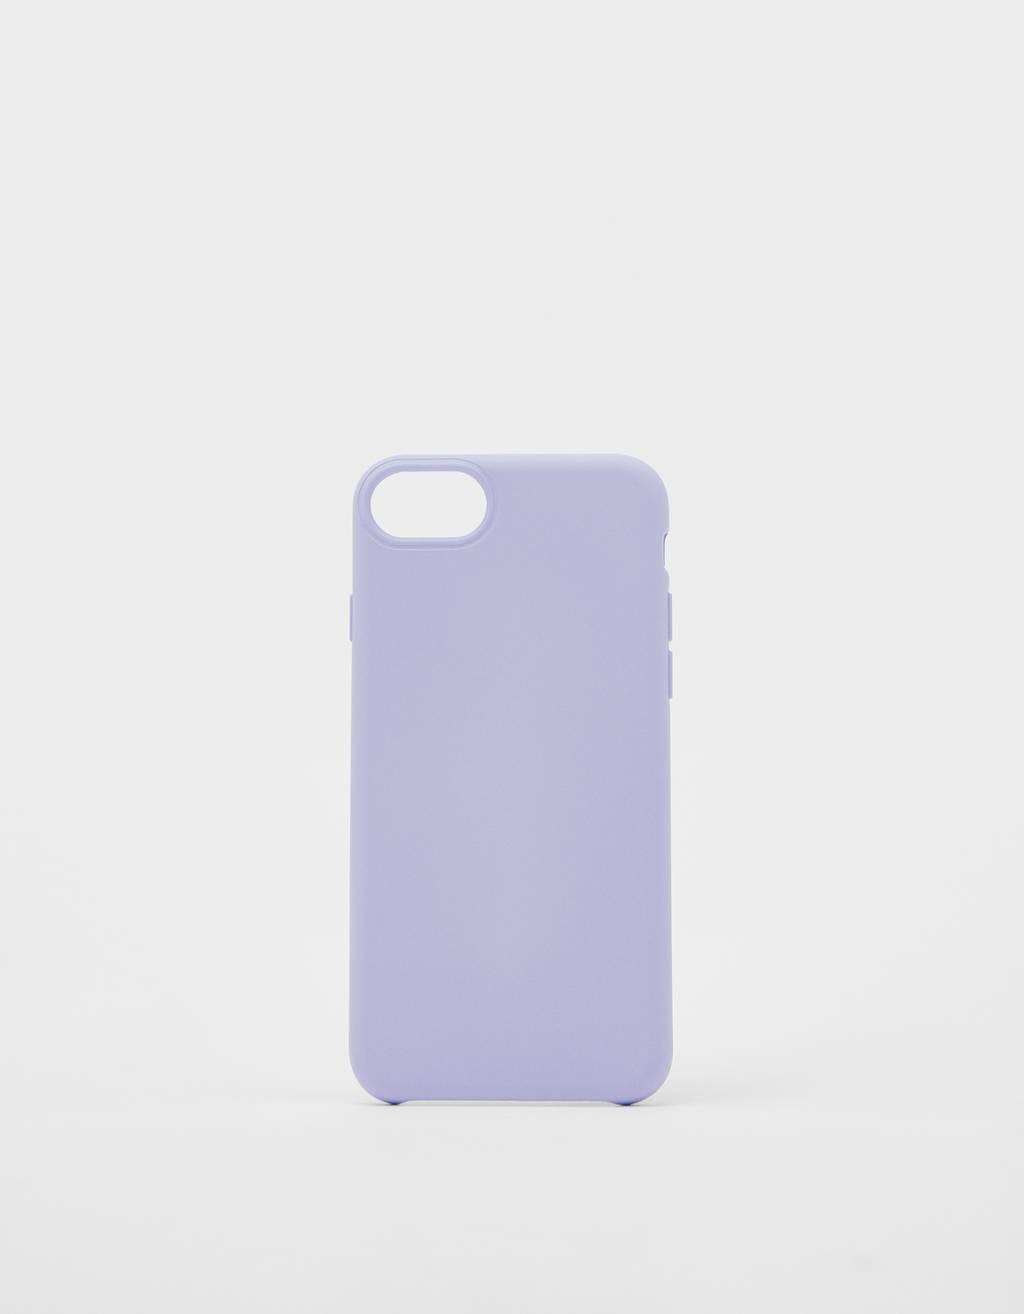 Carcassa color llis iPhone 6/6S/7/8